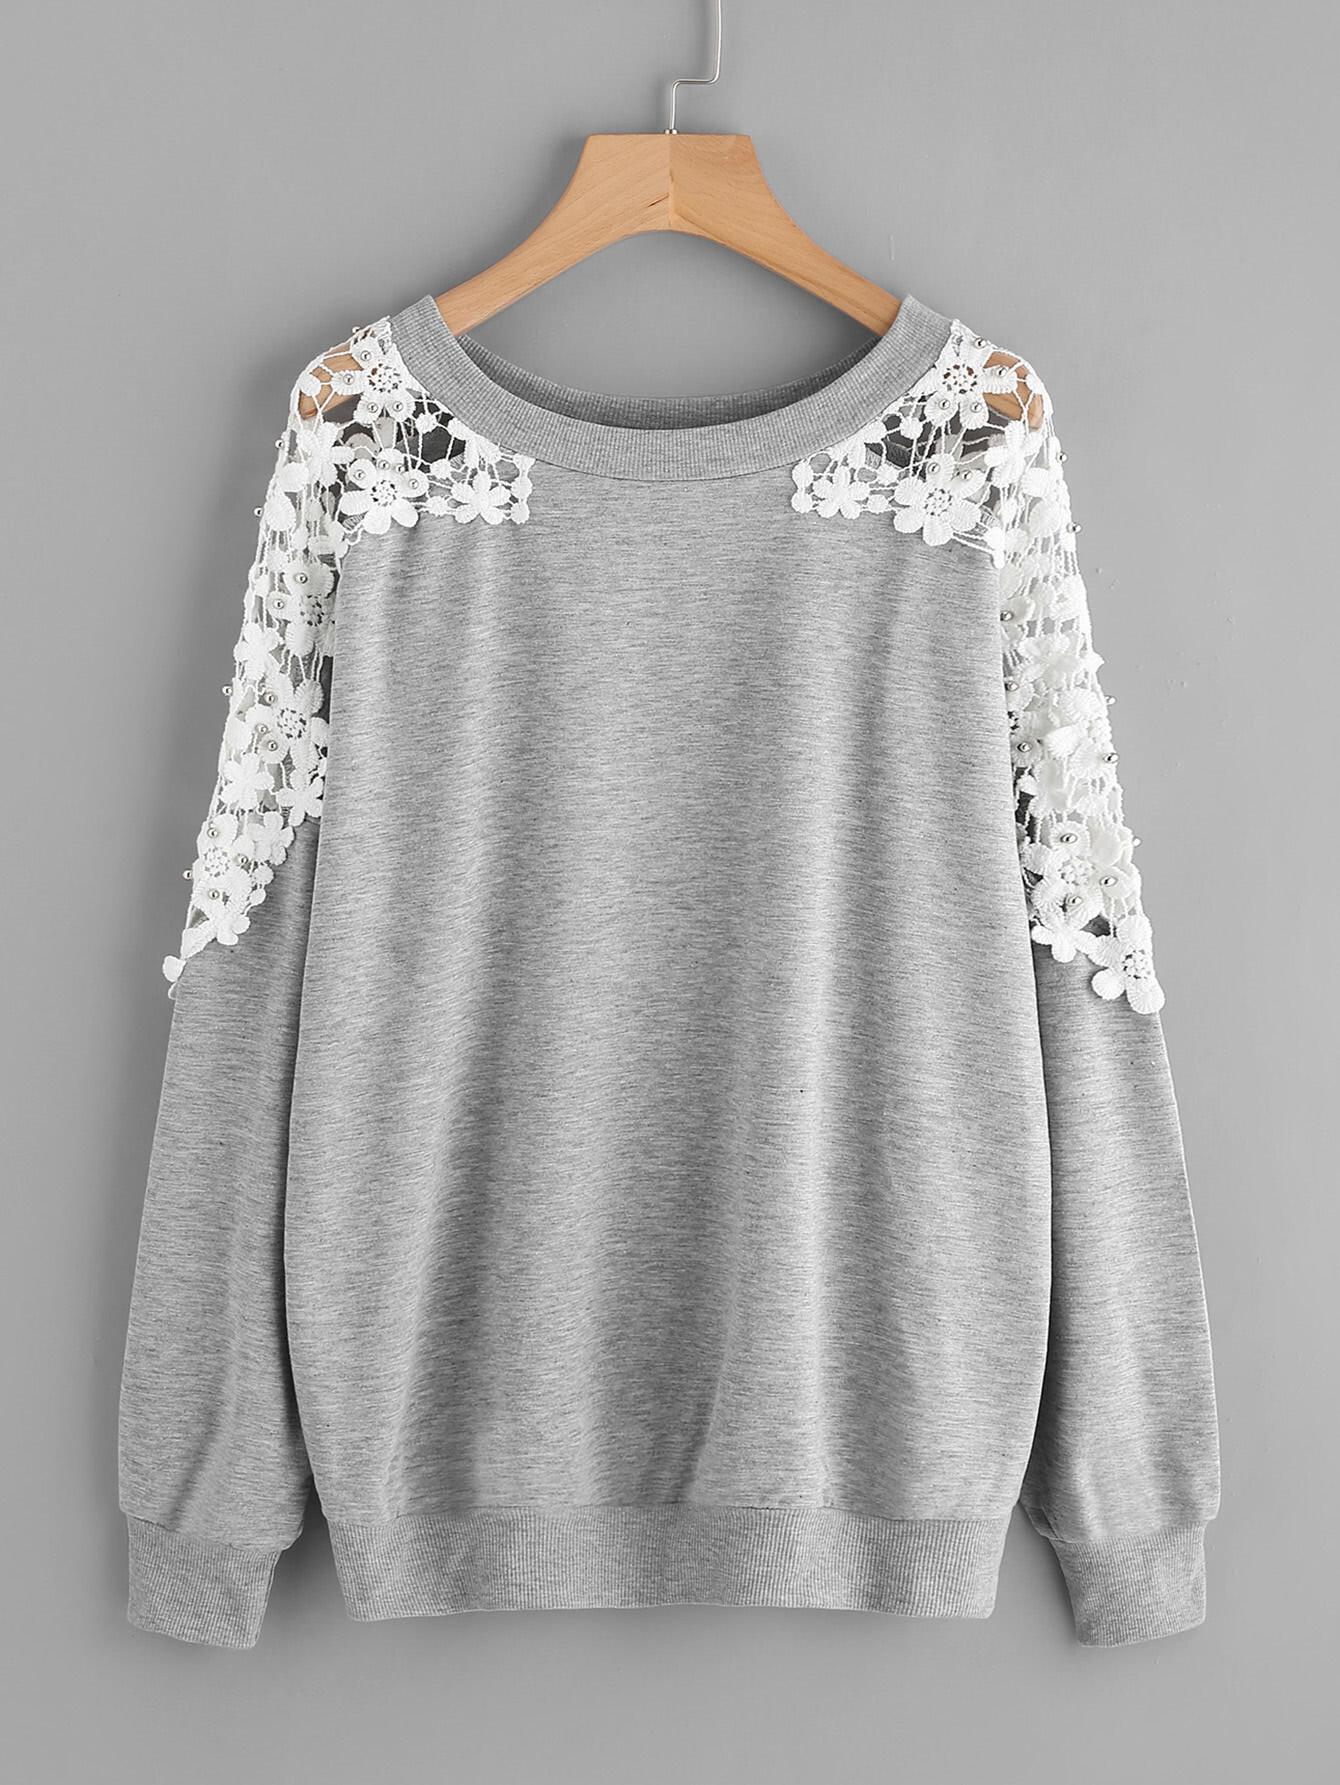 все цены на Lace Panel Beaded Sweatshirt